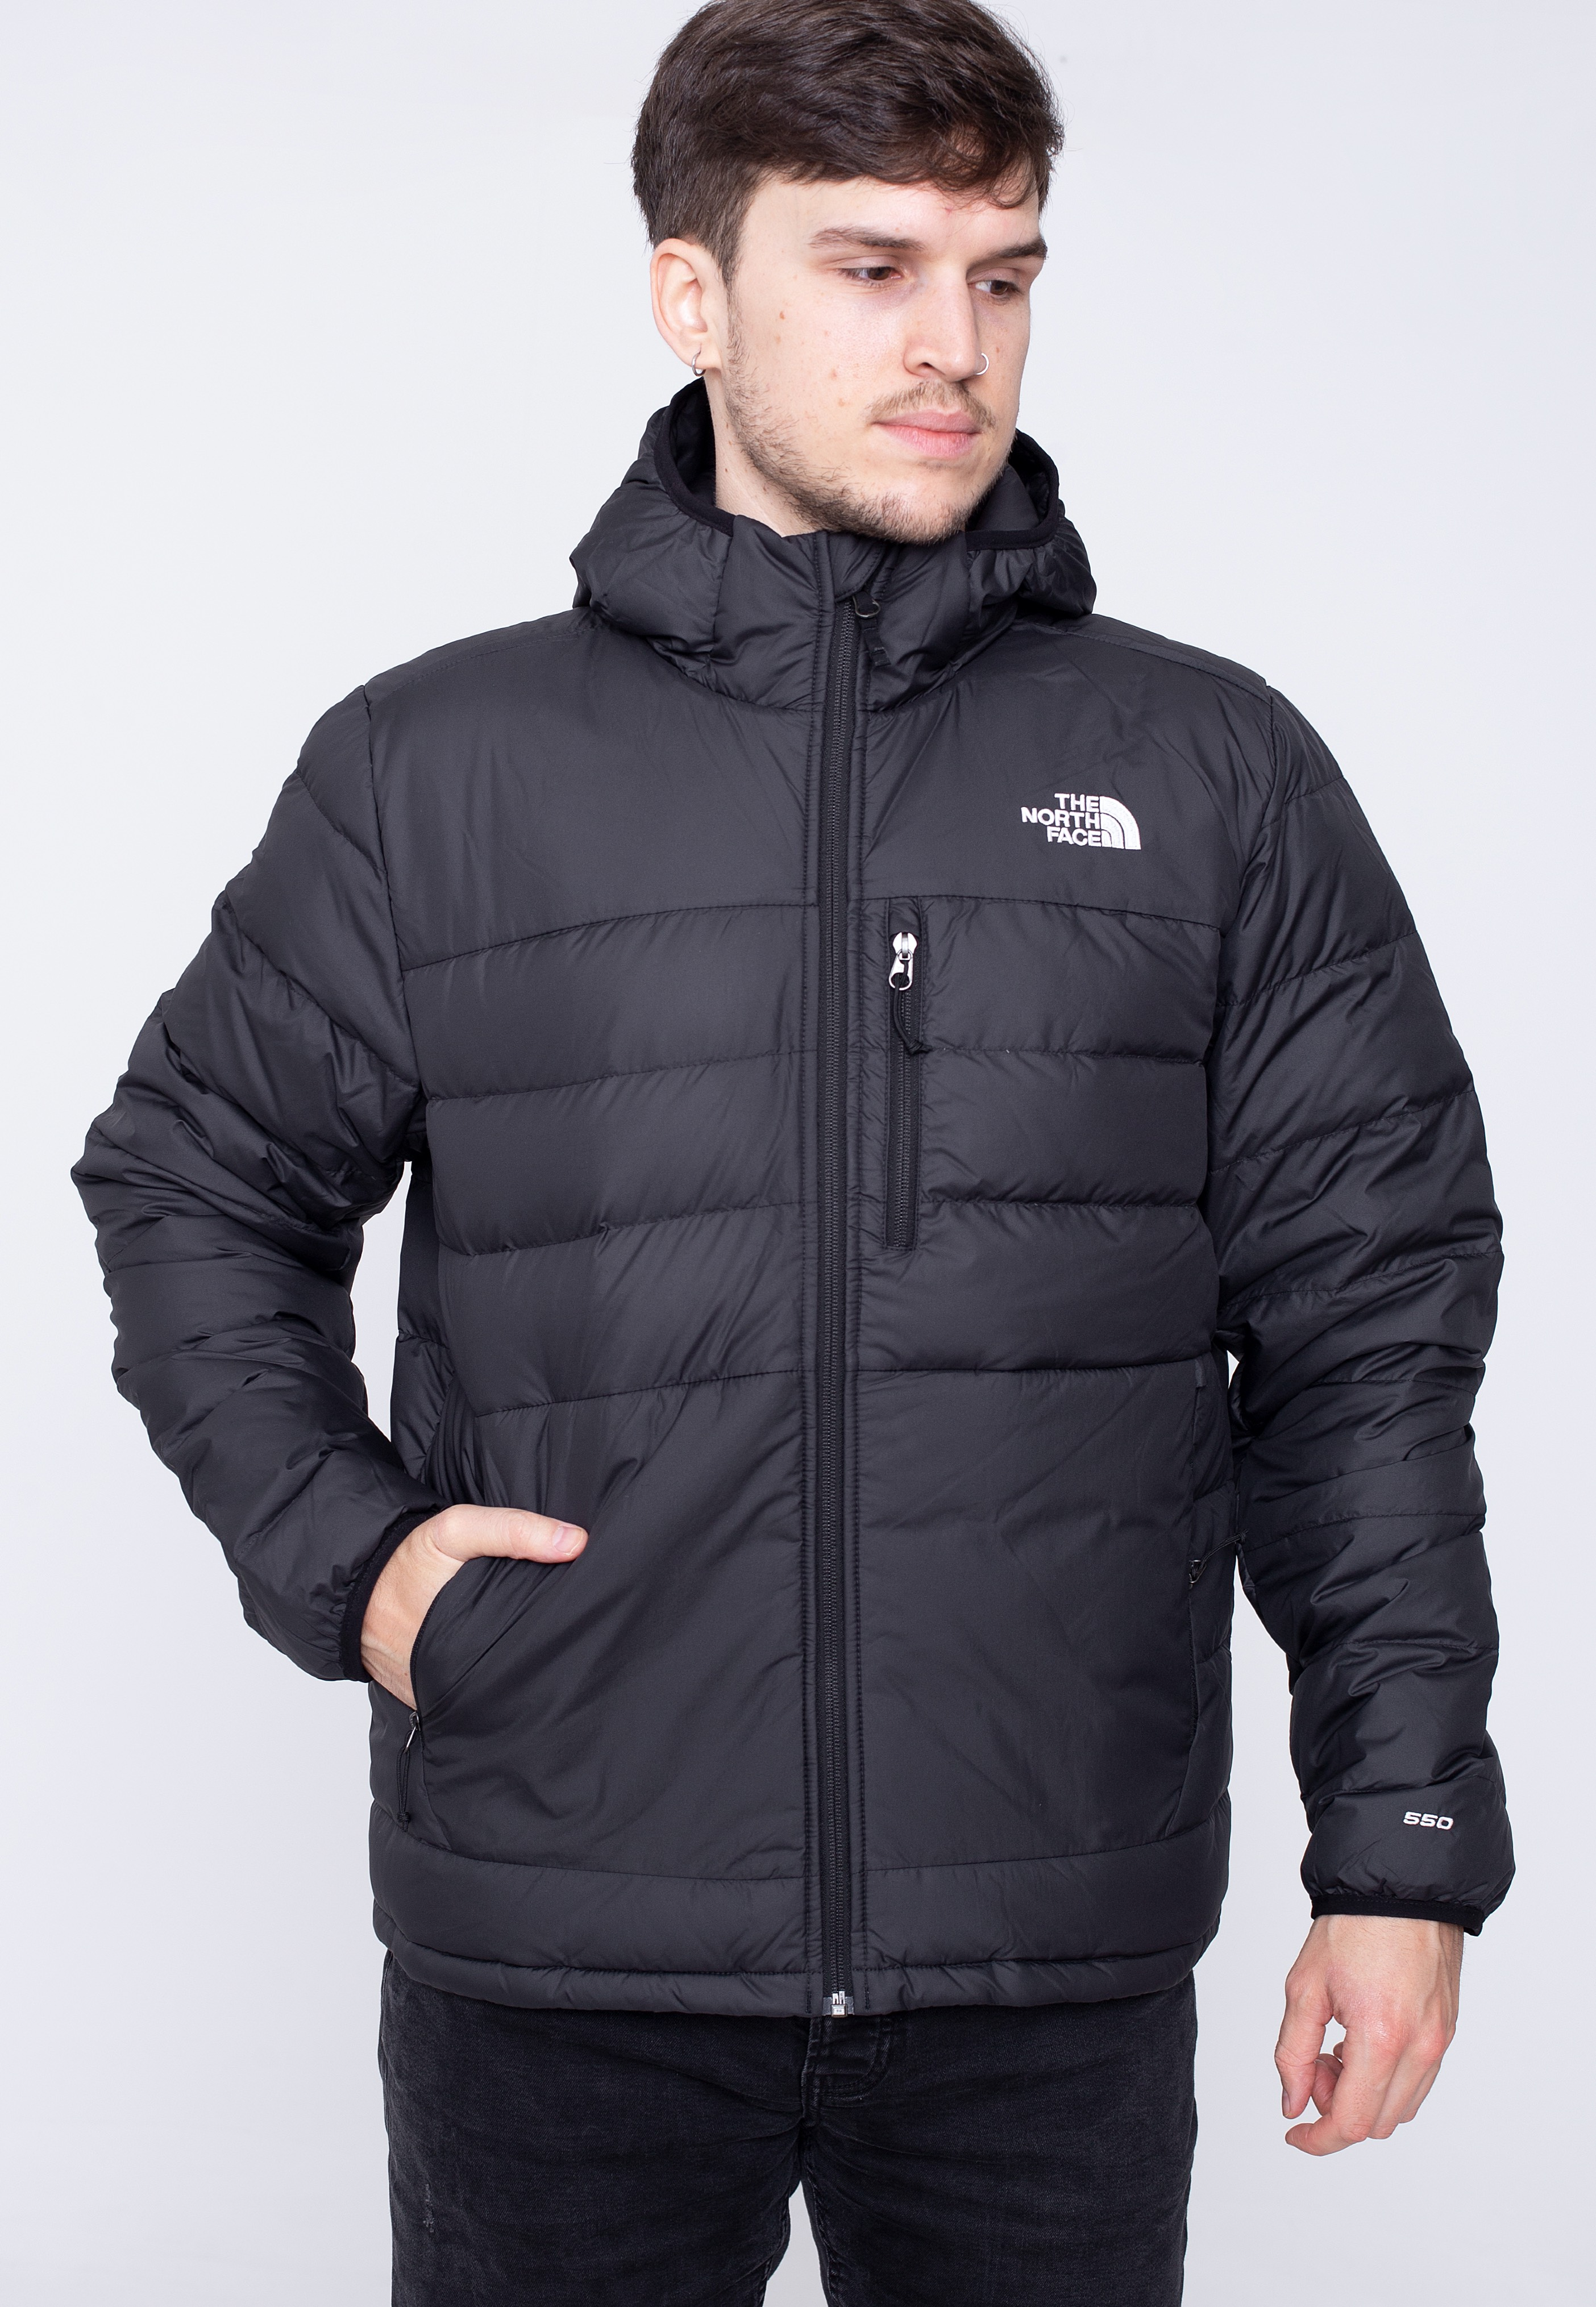 The North Face - Aconcagua 2 Black - Jackets